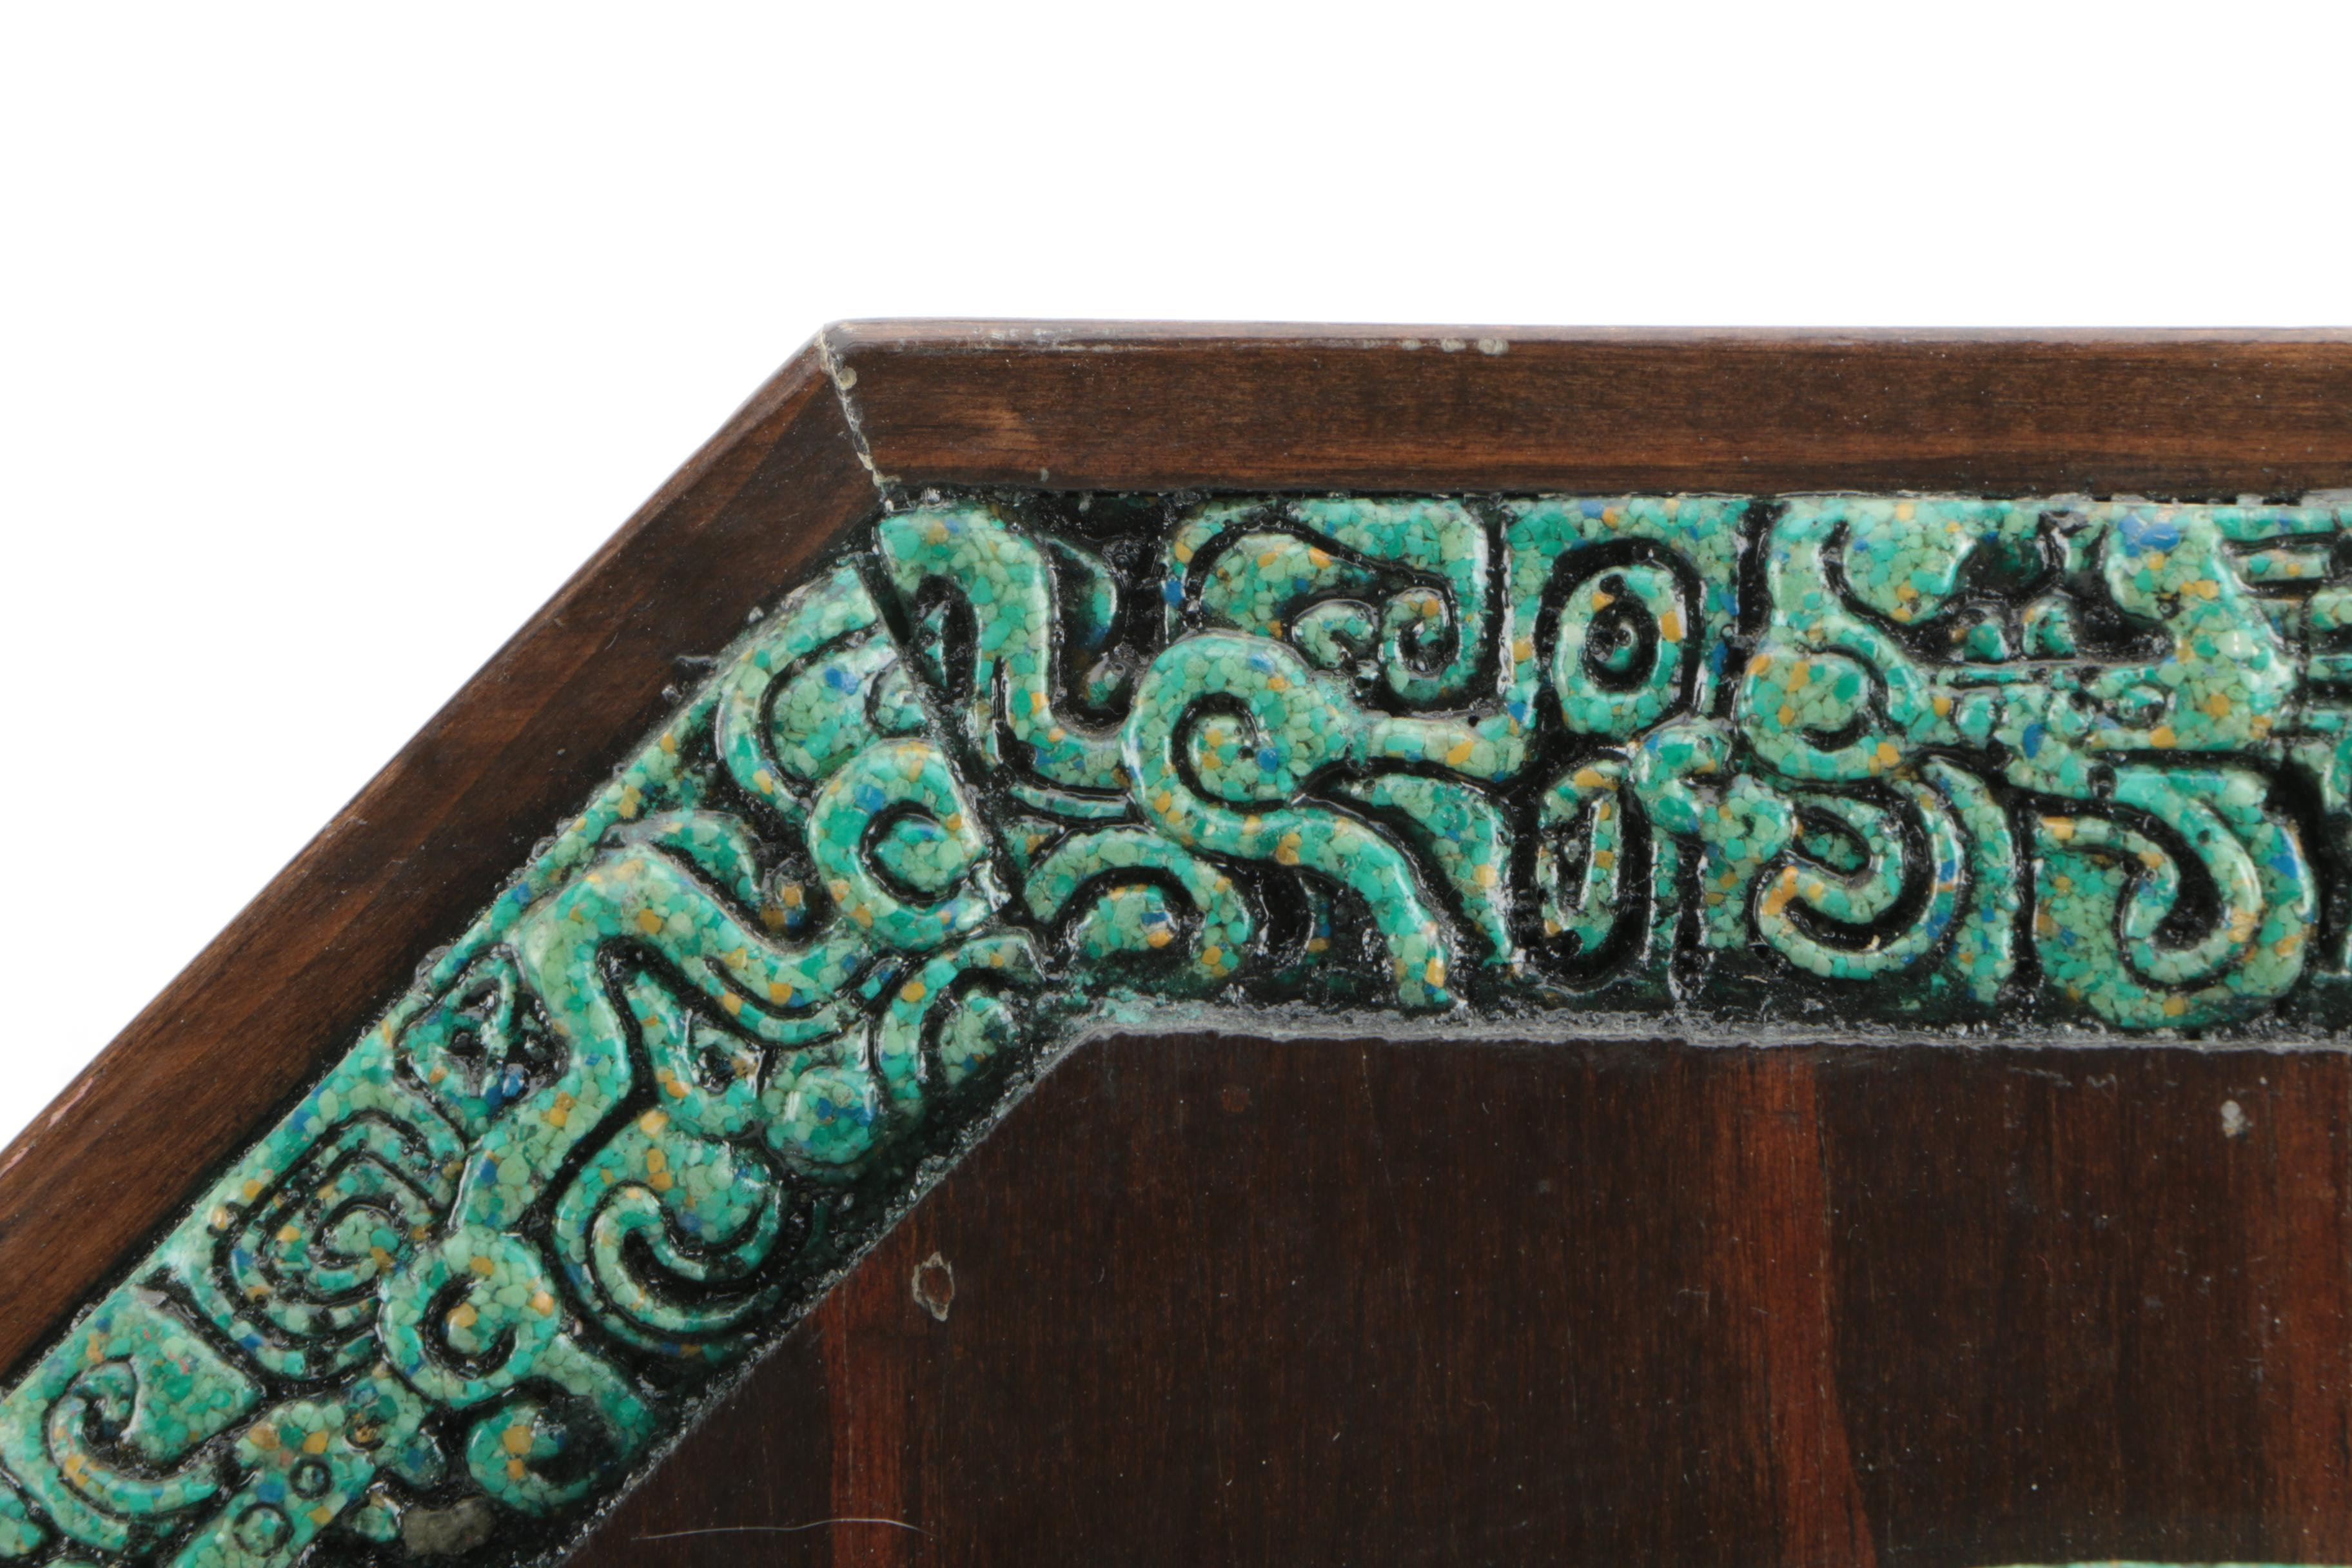 Aztec Calender Ceramic Wall Decor Ebth